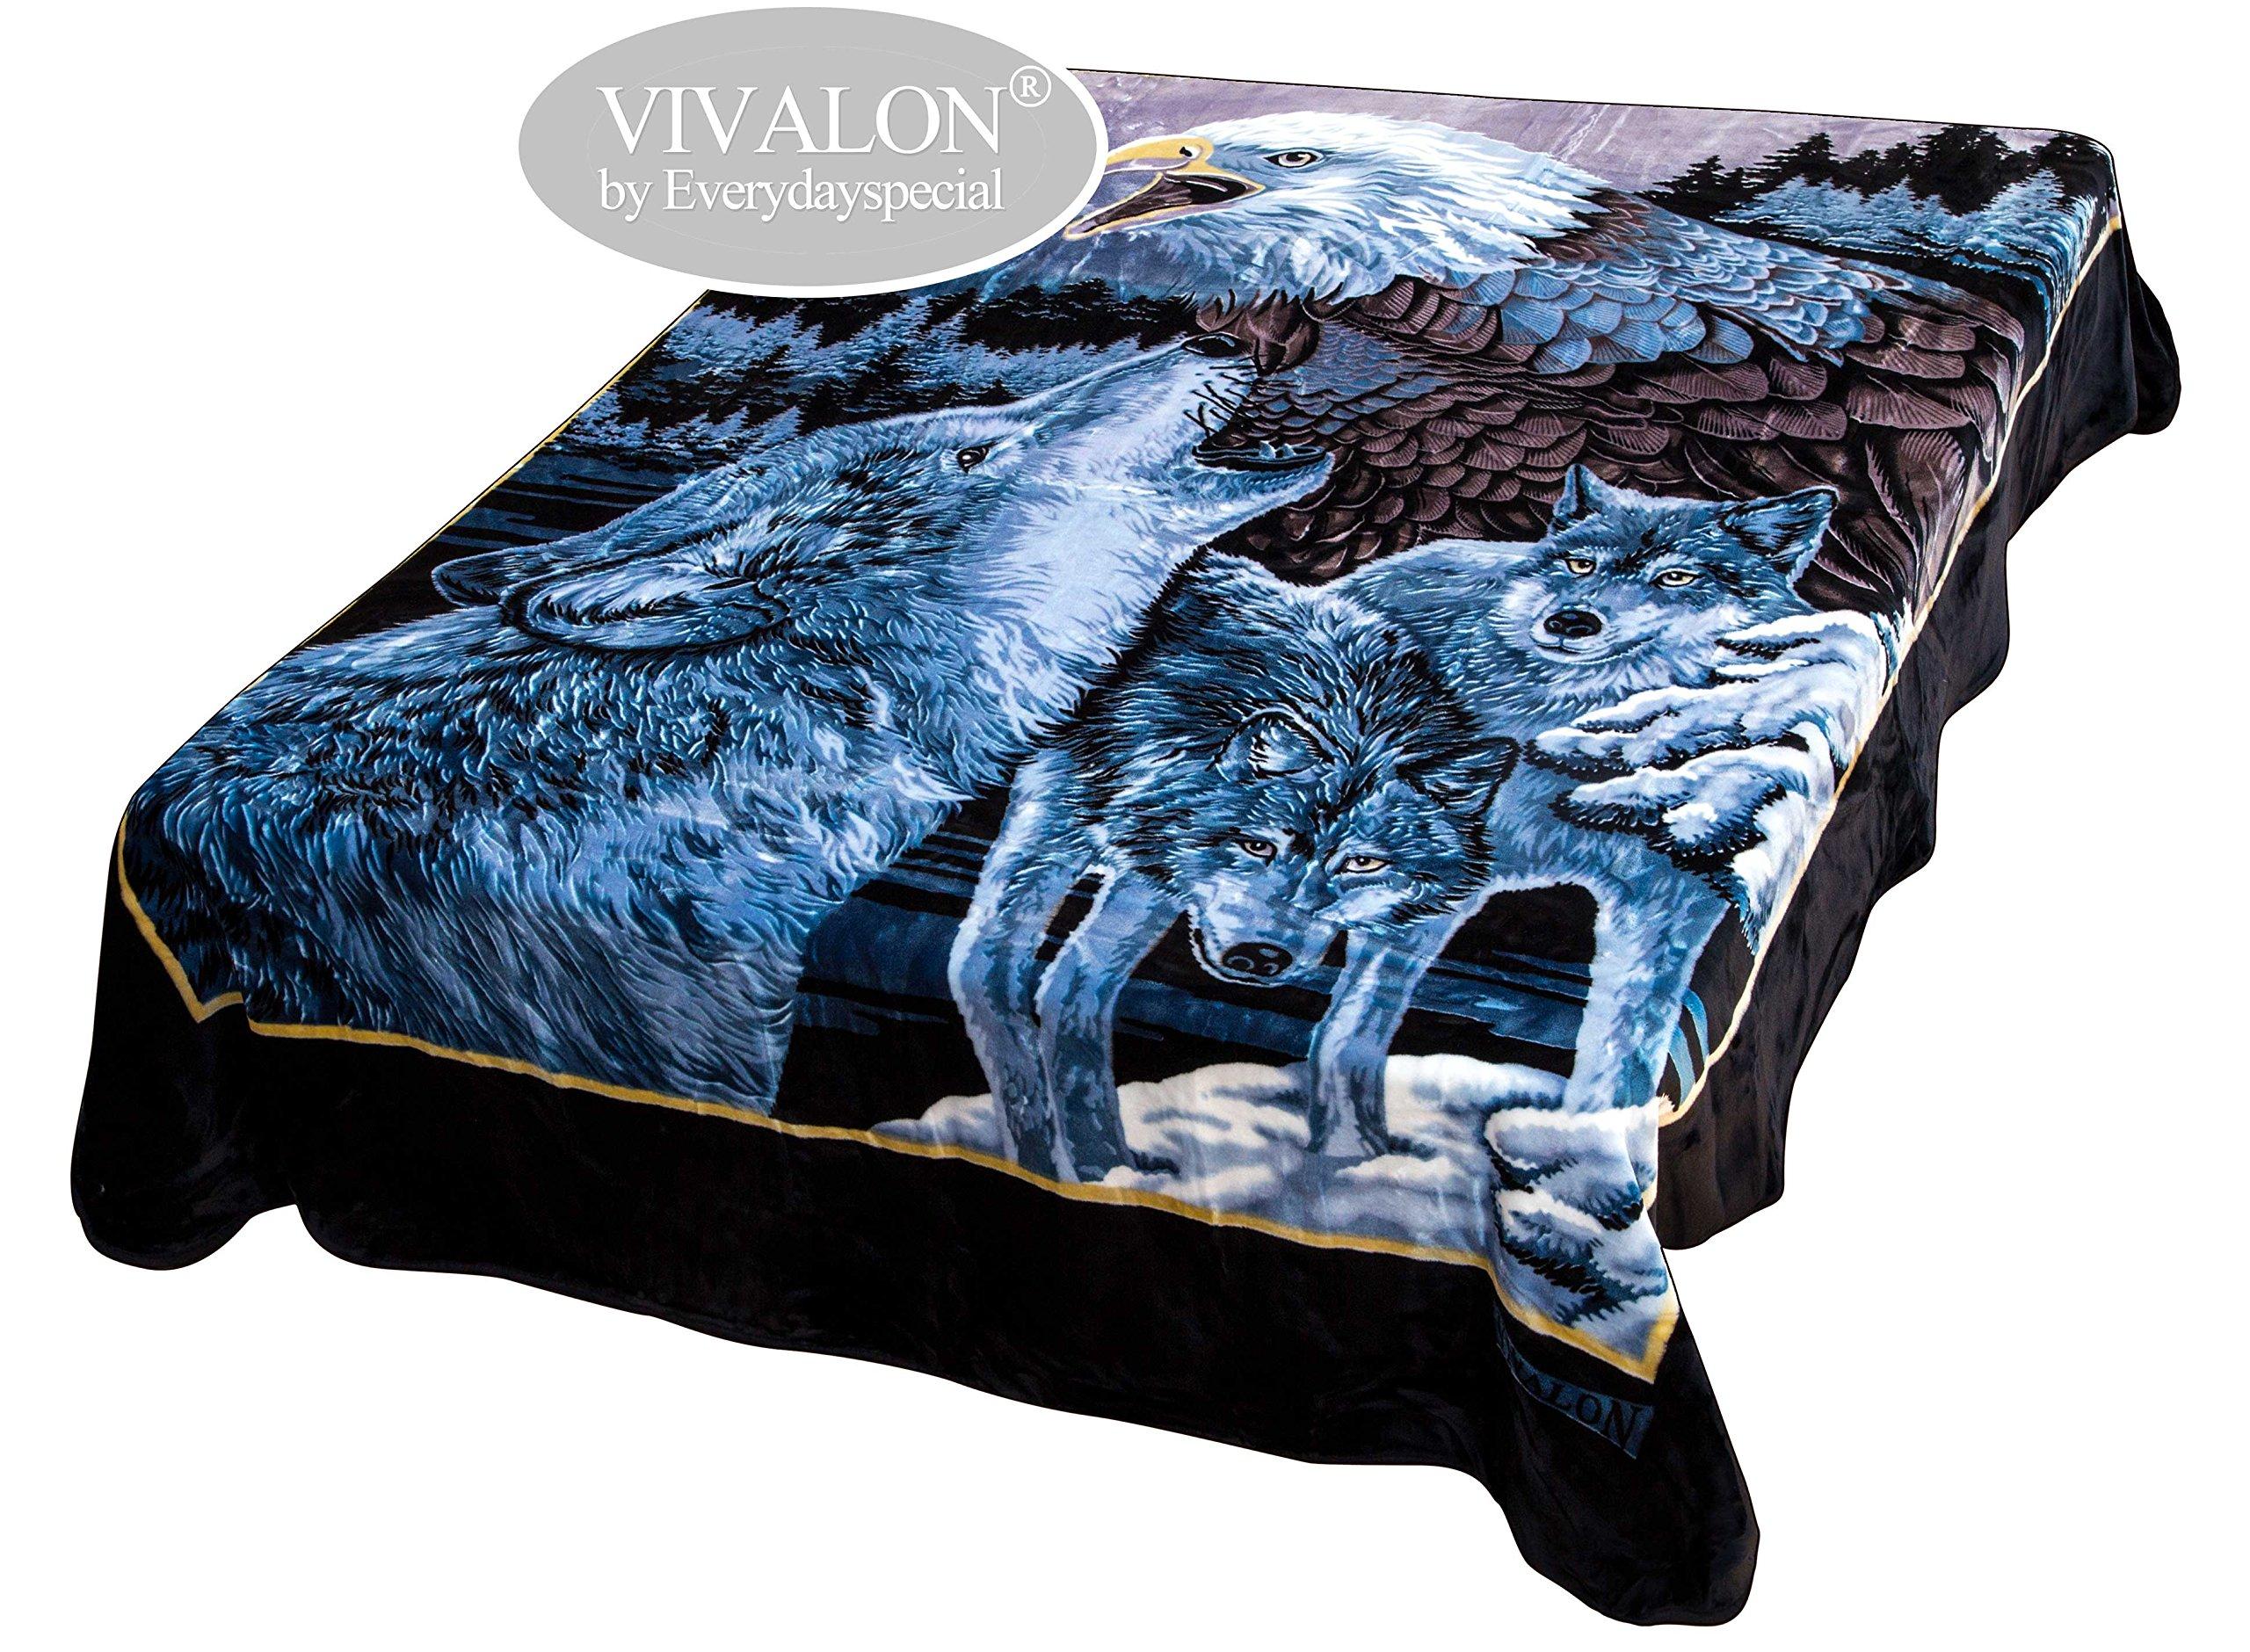 VIVALON Ultra Silky Soft Heavy Duty Quality Korean Mink Printed Blue Eagle Wolves Reversible Blanket Queen Size